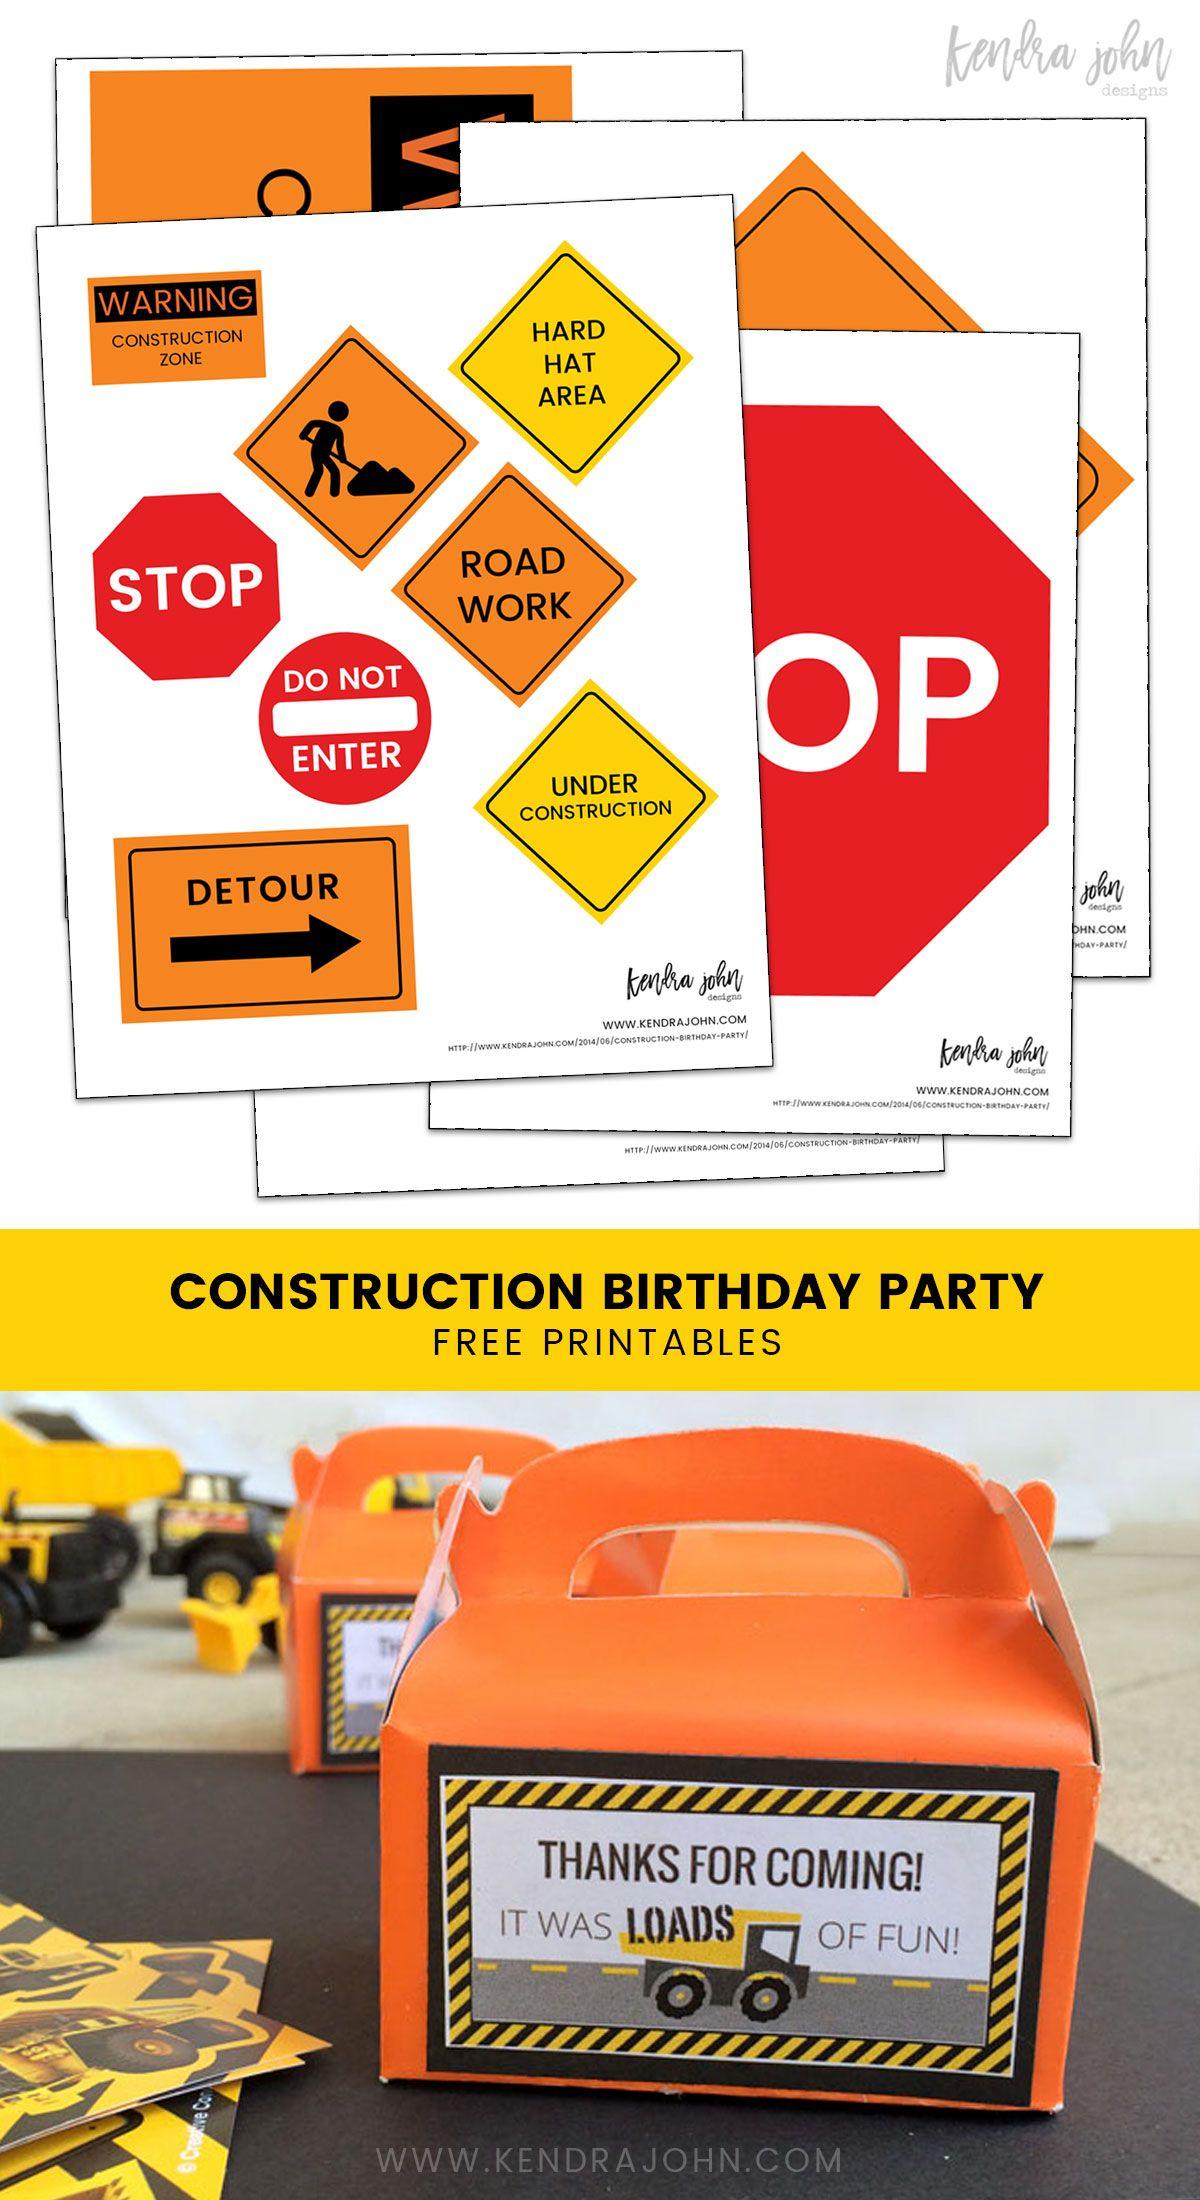 Construction-Birthday-Party2 - Kendra John Designs